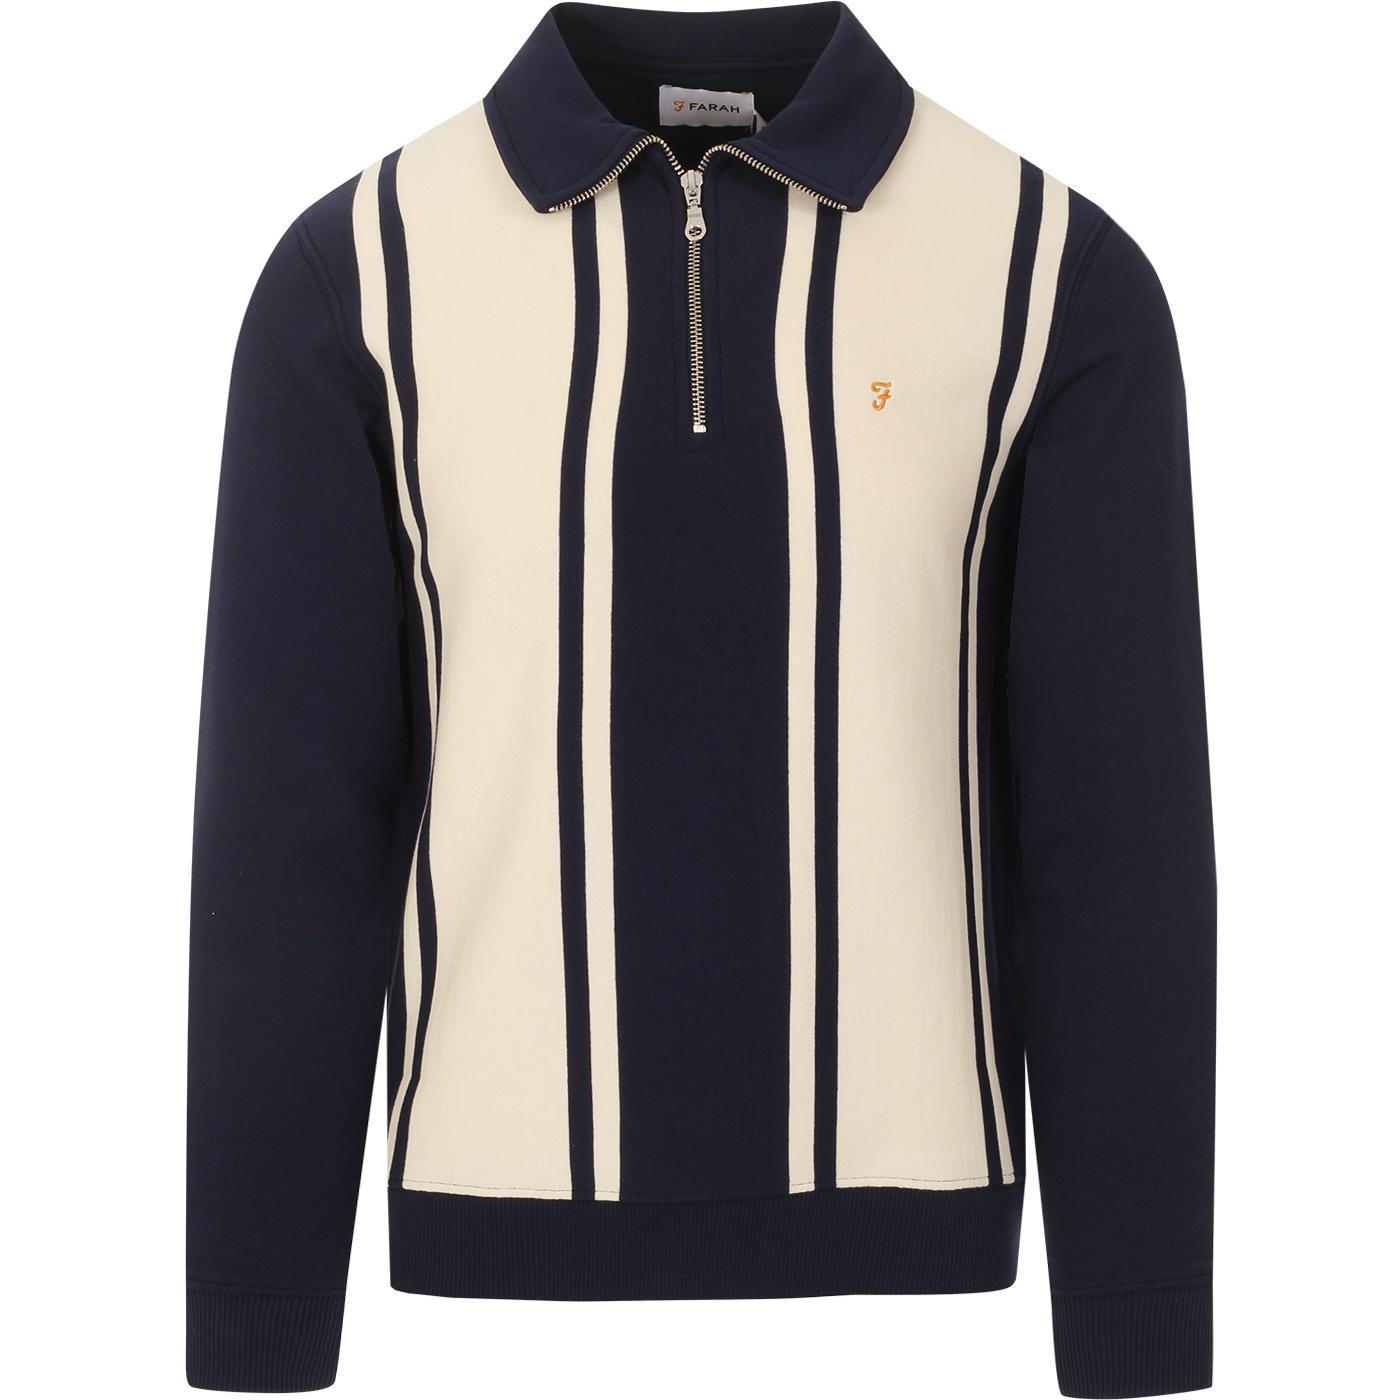 California FARAH Mod Stripe Panel Polo Sweatshirt